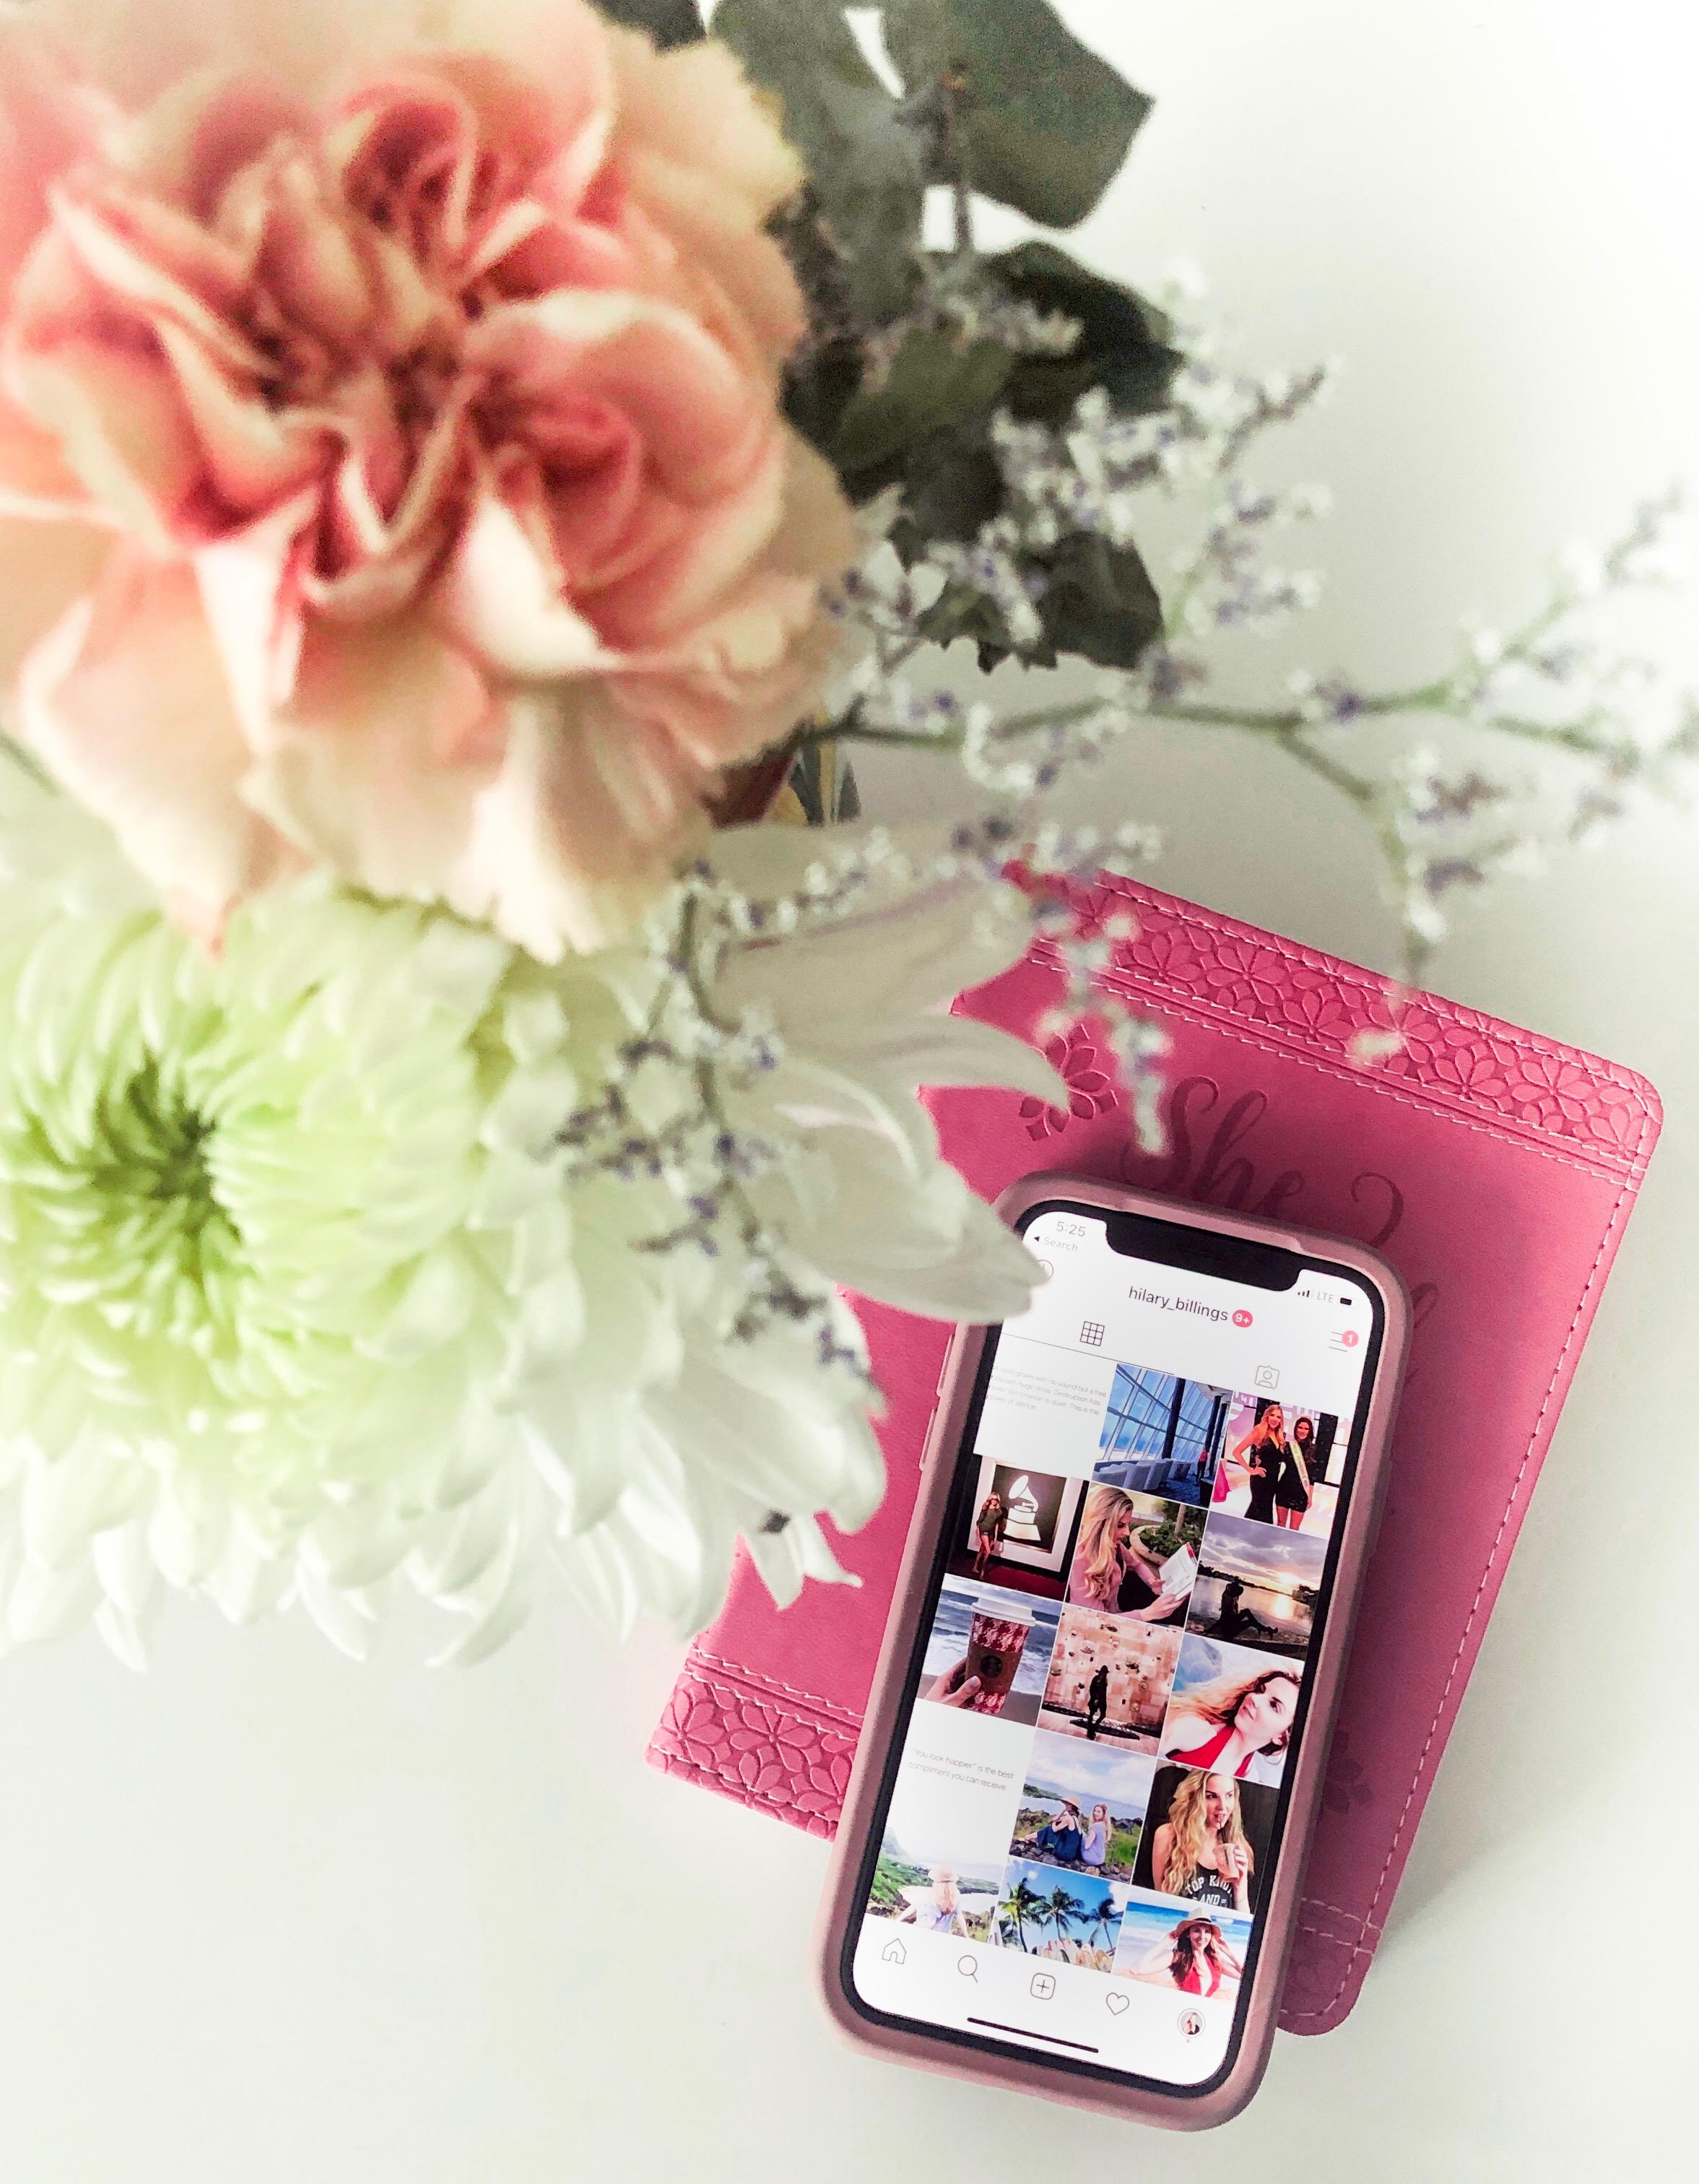 Hilary phone 2.jpg